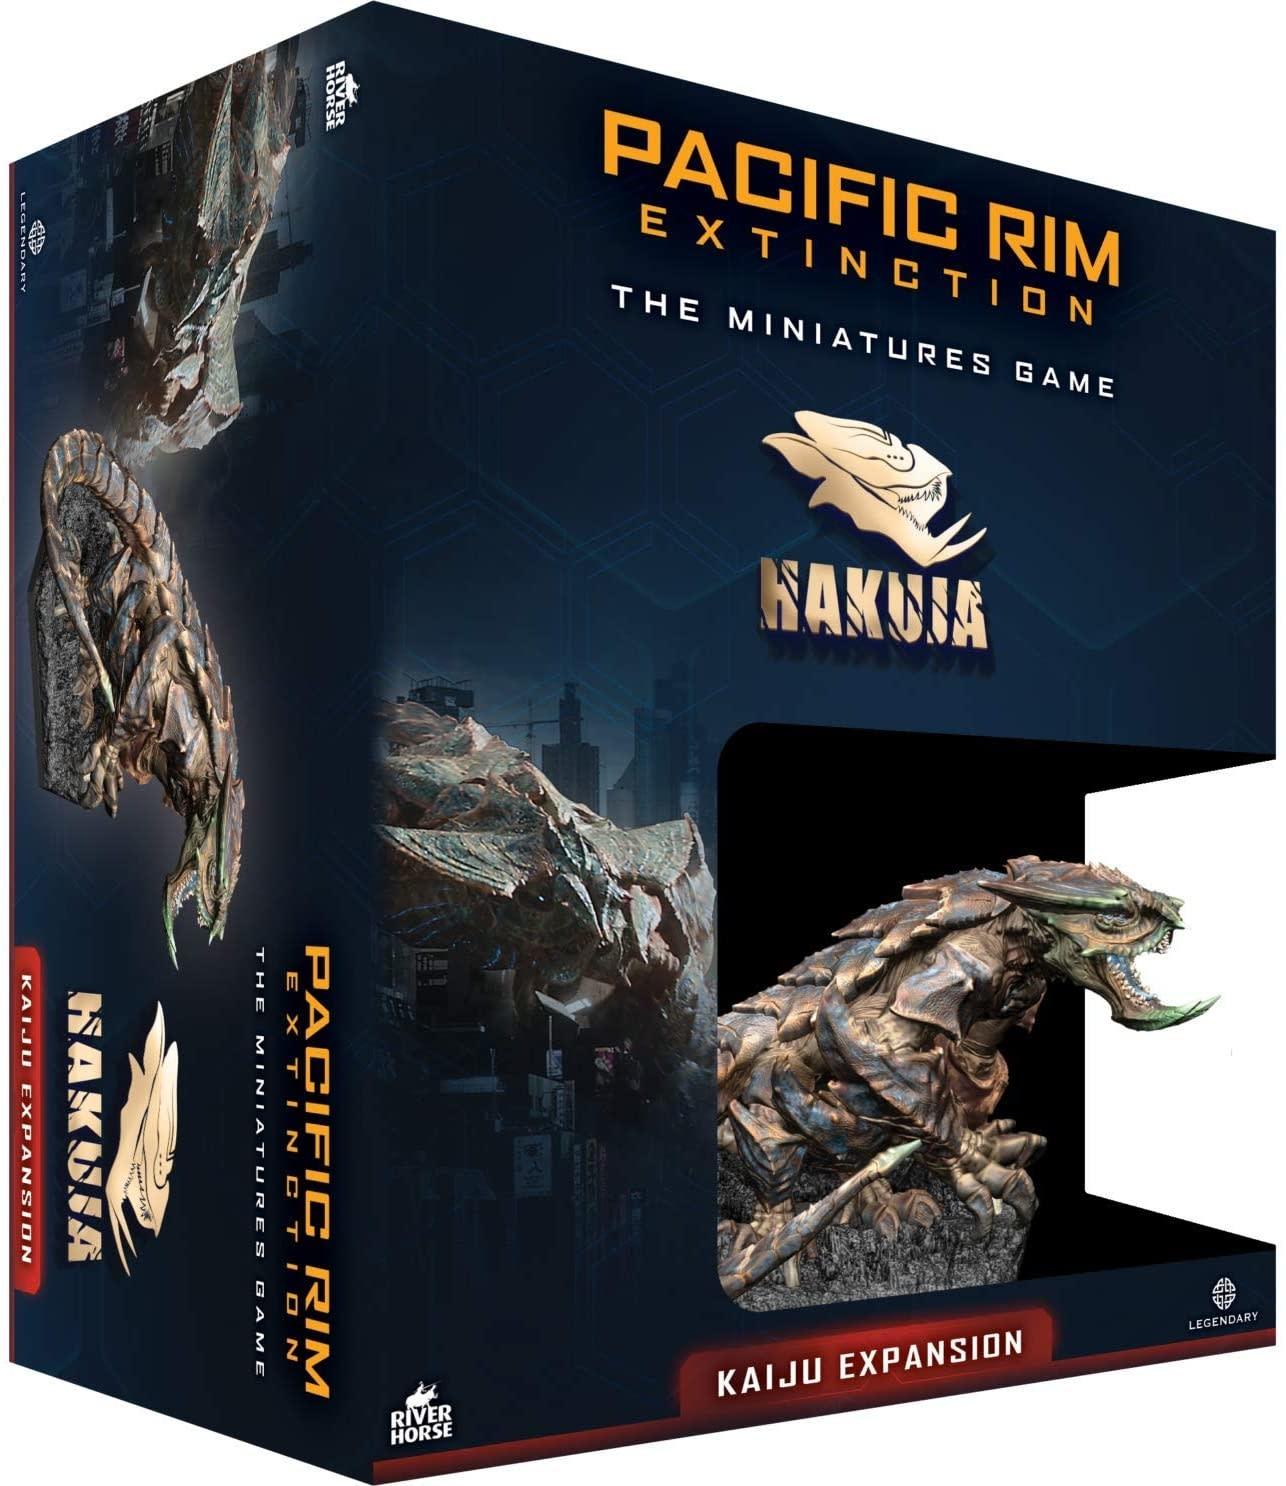 Pacific Rim: Exctinction - Hakuja Exp. (WV1)